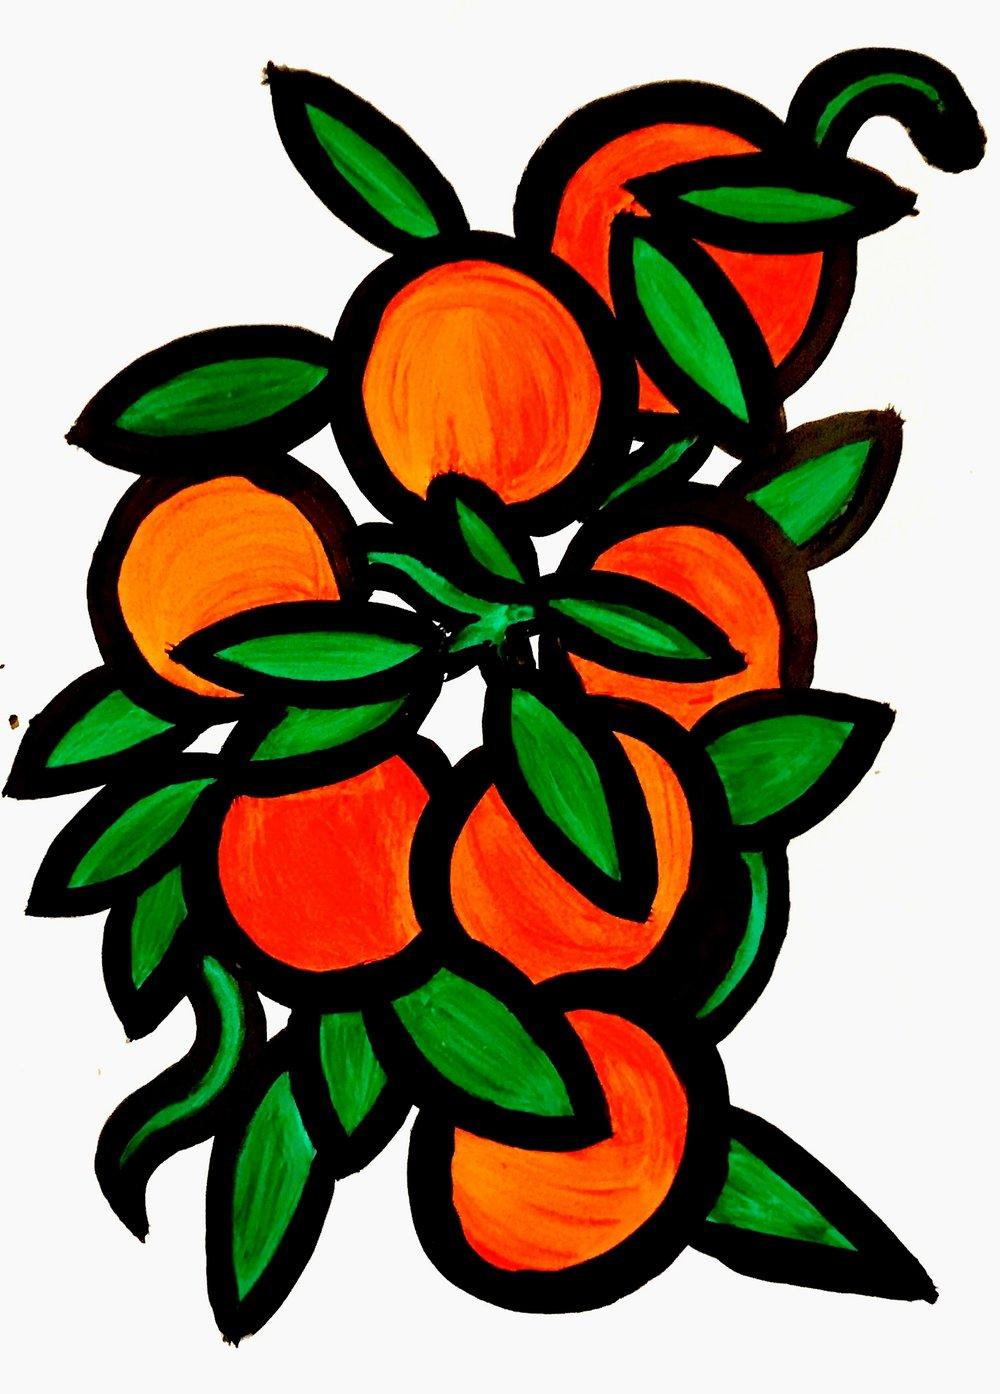 Clementine Study